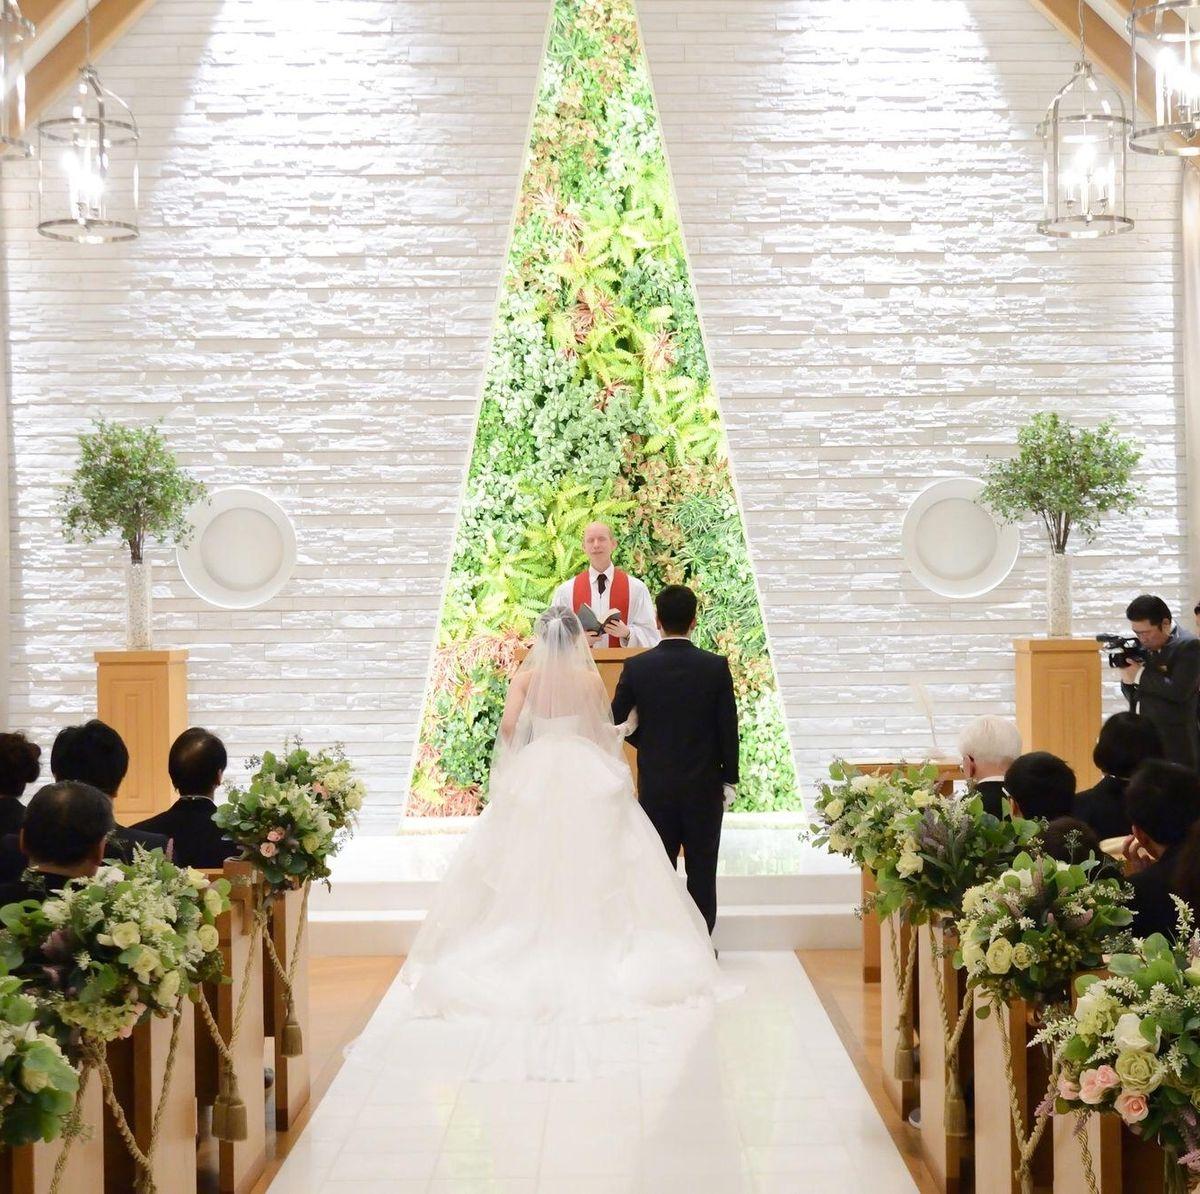 tk7_weddingさんのホテル阪神大阪(HOTEL HANSHIN OSAKA)写真1枚目